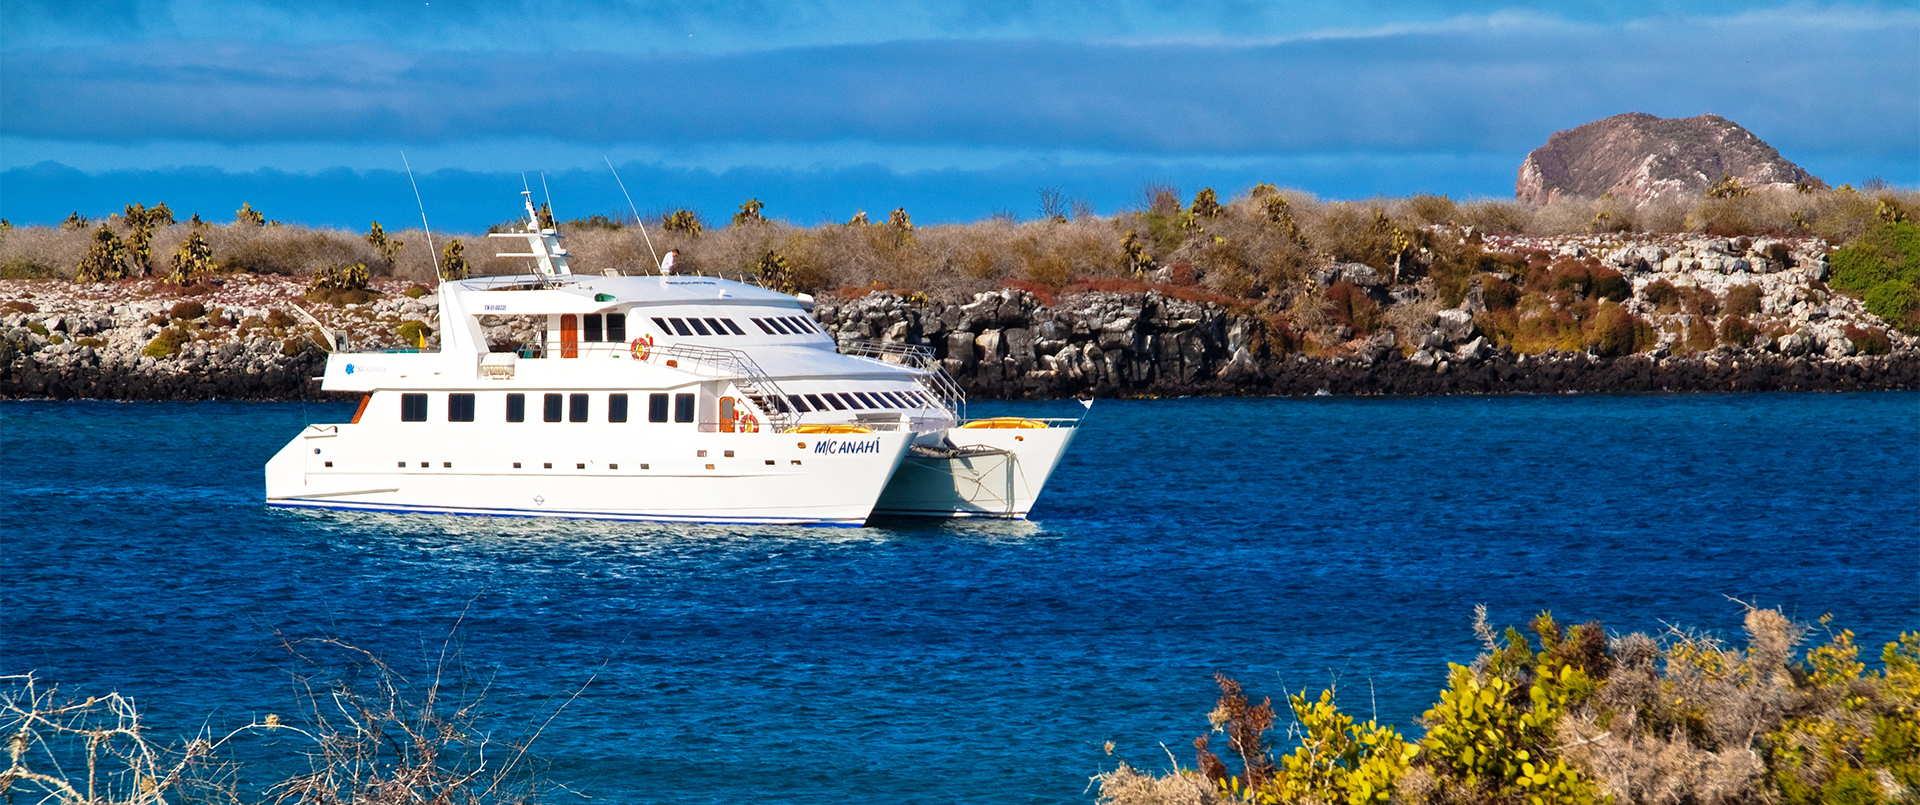 Galapagos and the Anahi Cruise